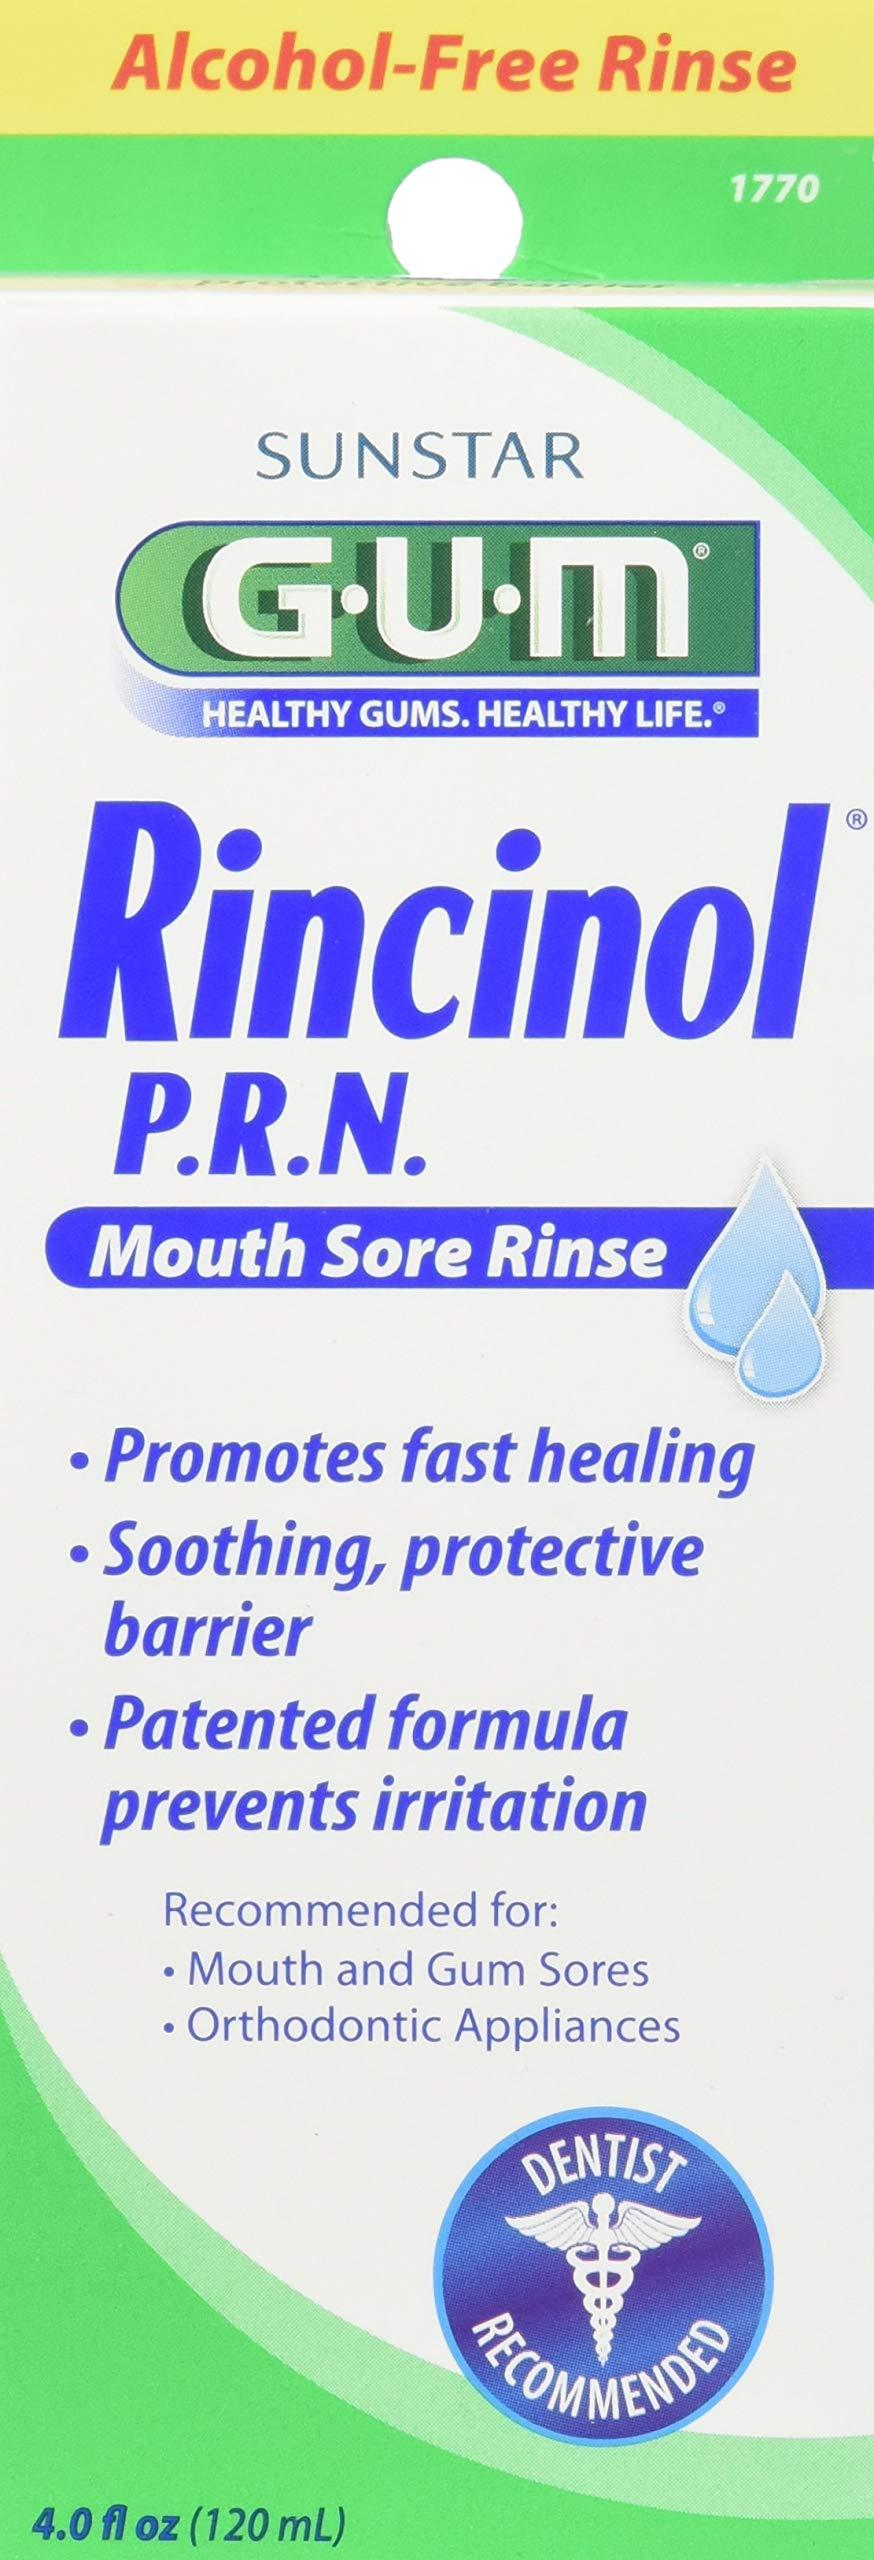 GUM Rincinol P.R.N. Mouth Sore Rinse - 4 fl oz, Pack of 4 by Gum